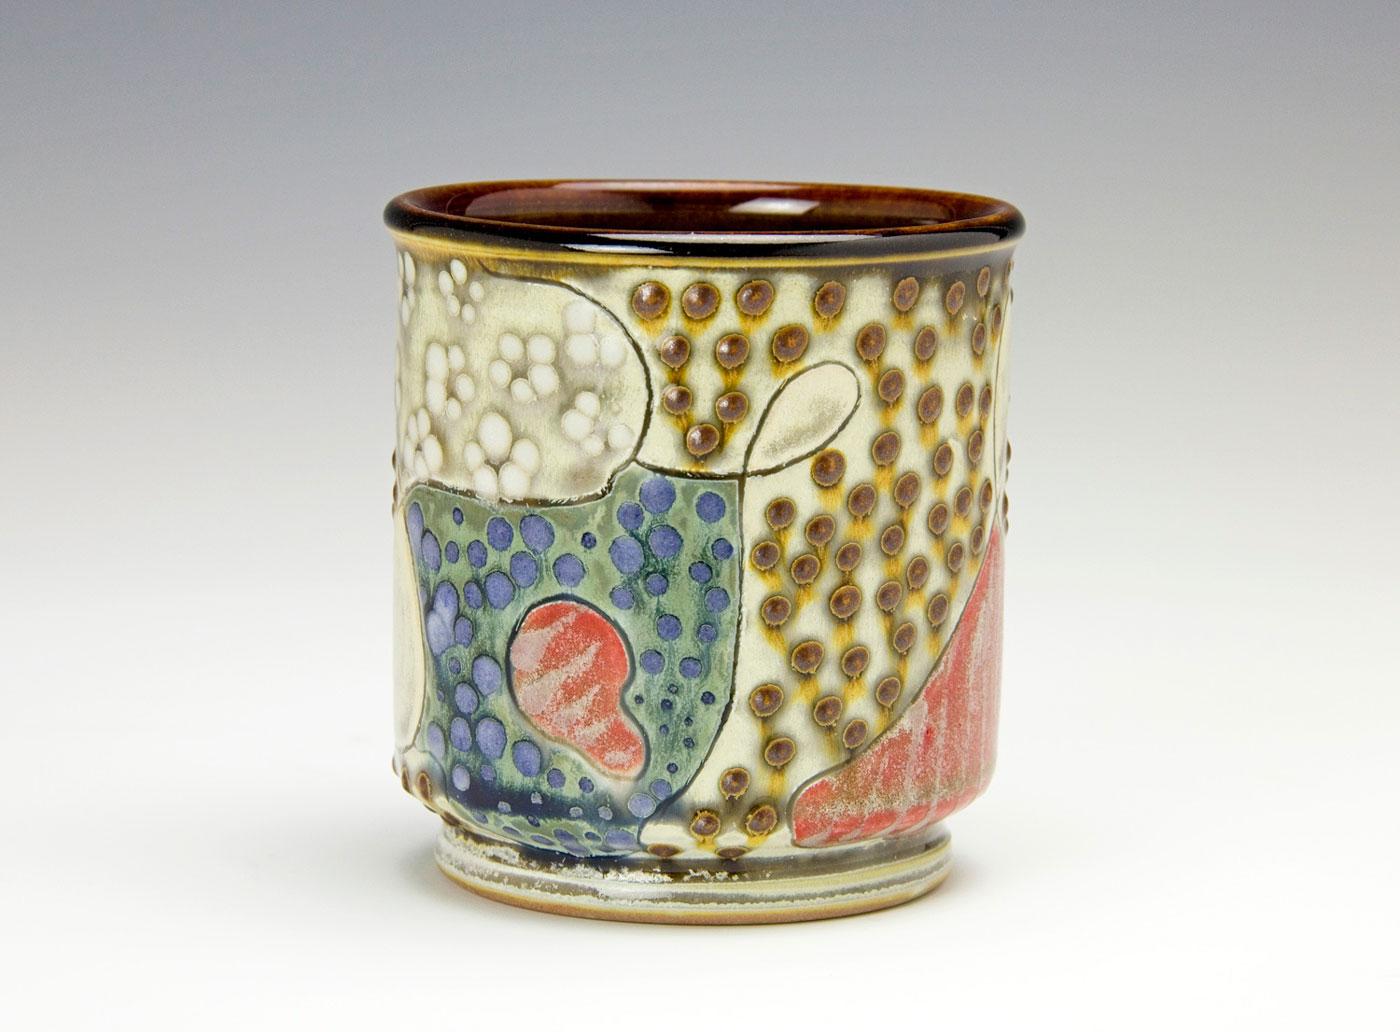 Pattern-Medley-North-Carolina-pottery-cup-Samantha-Henneke.jpg